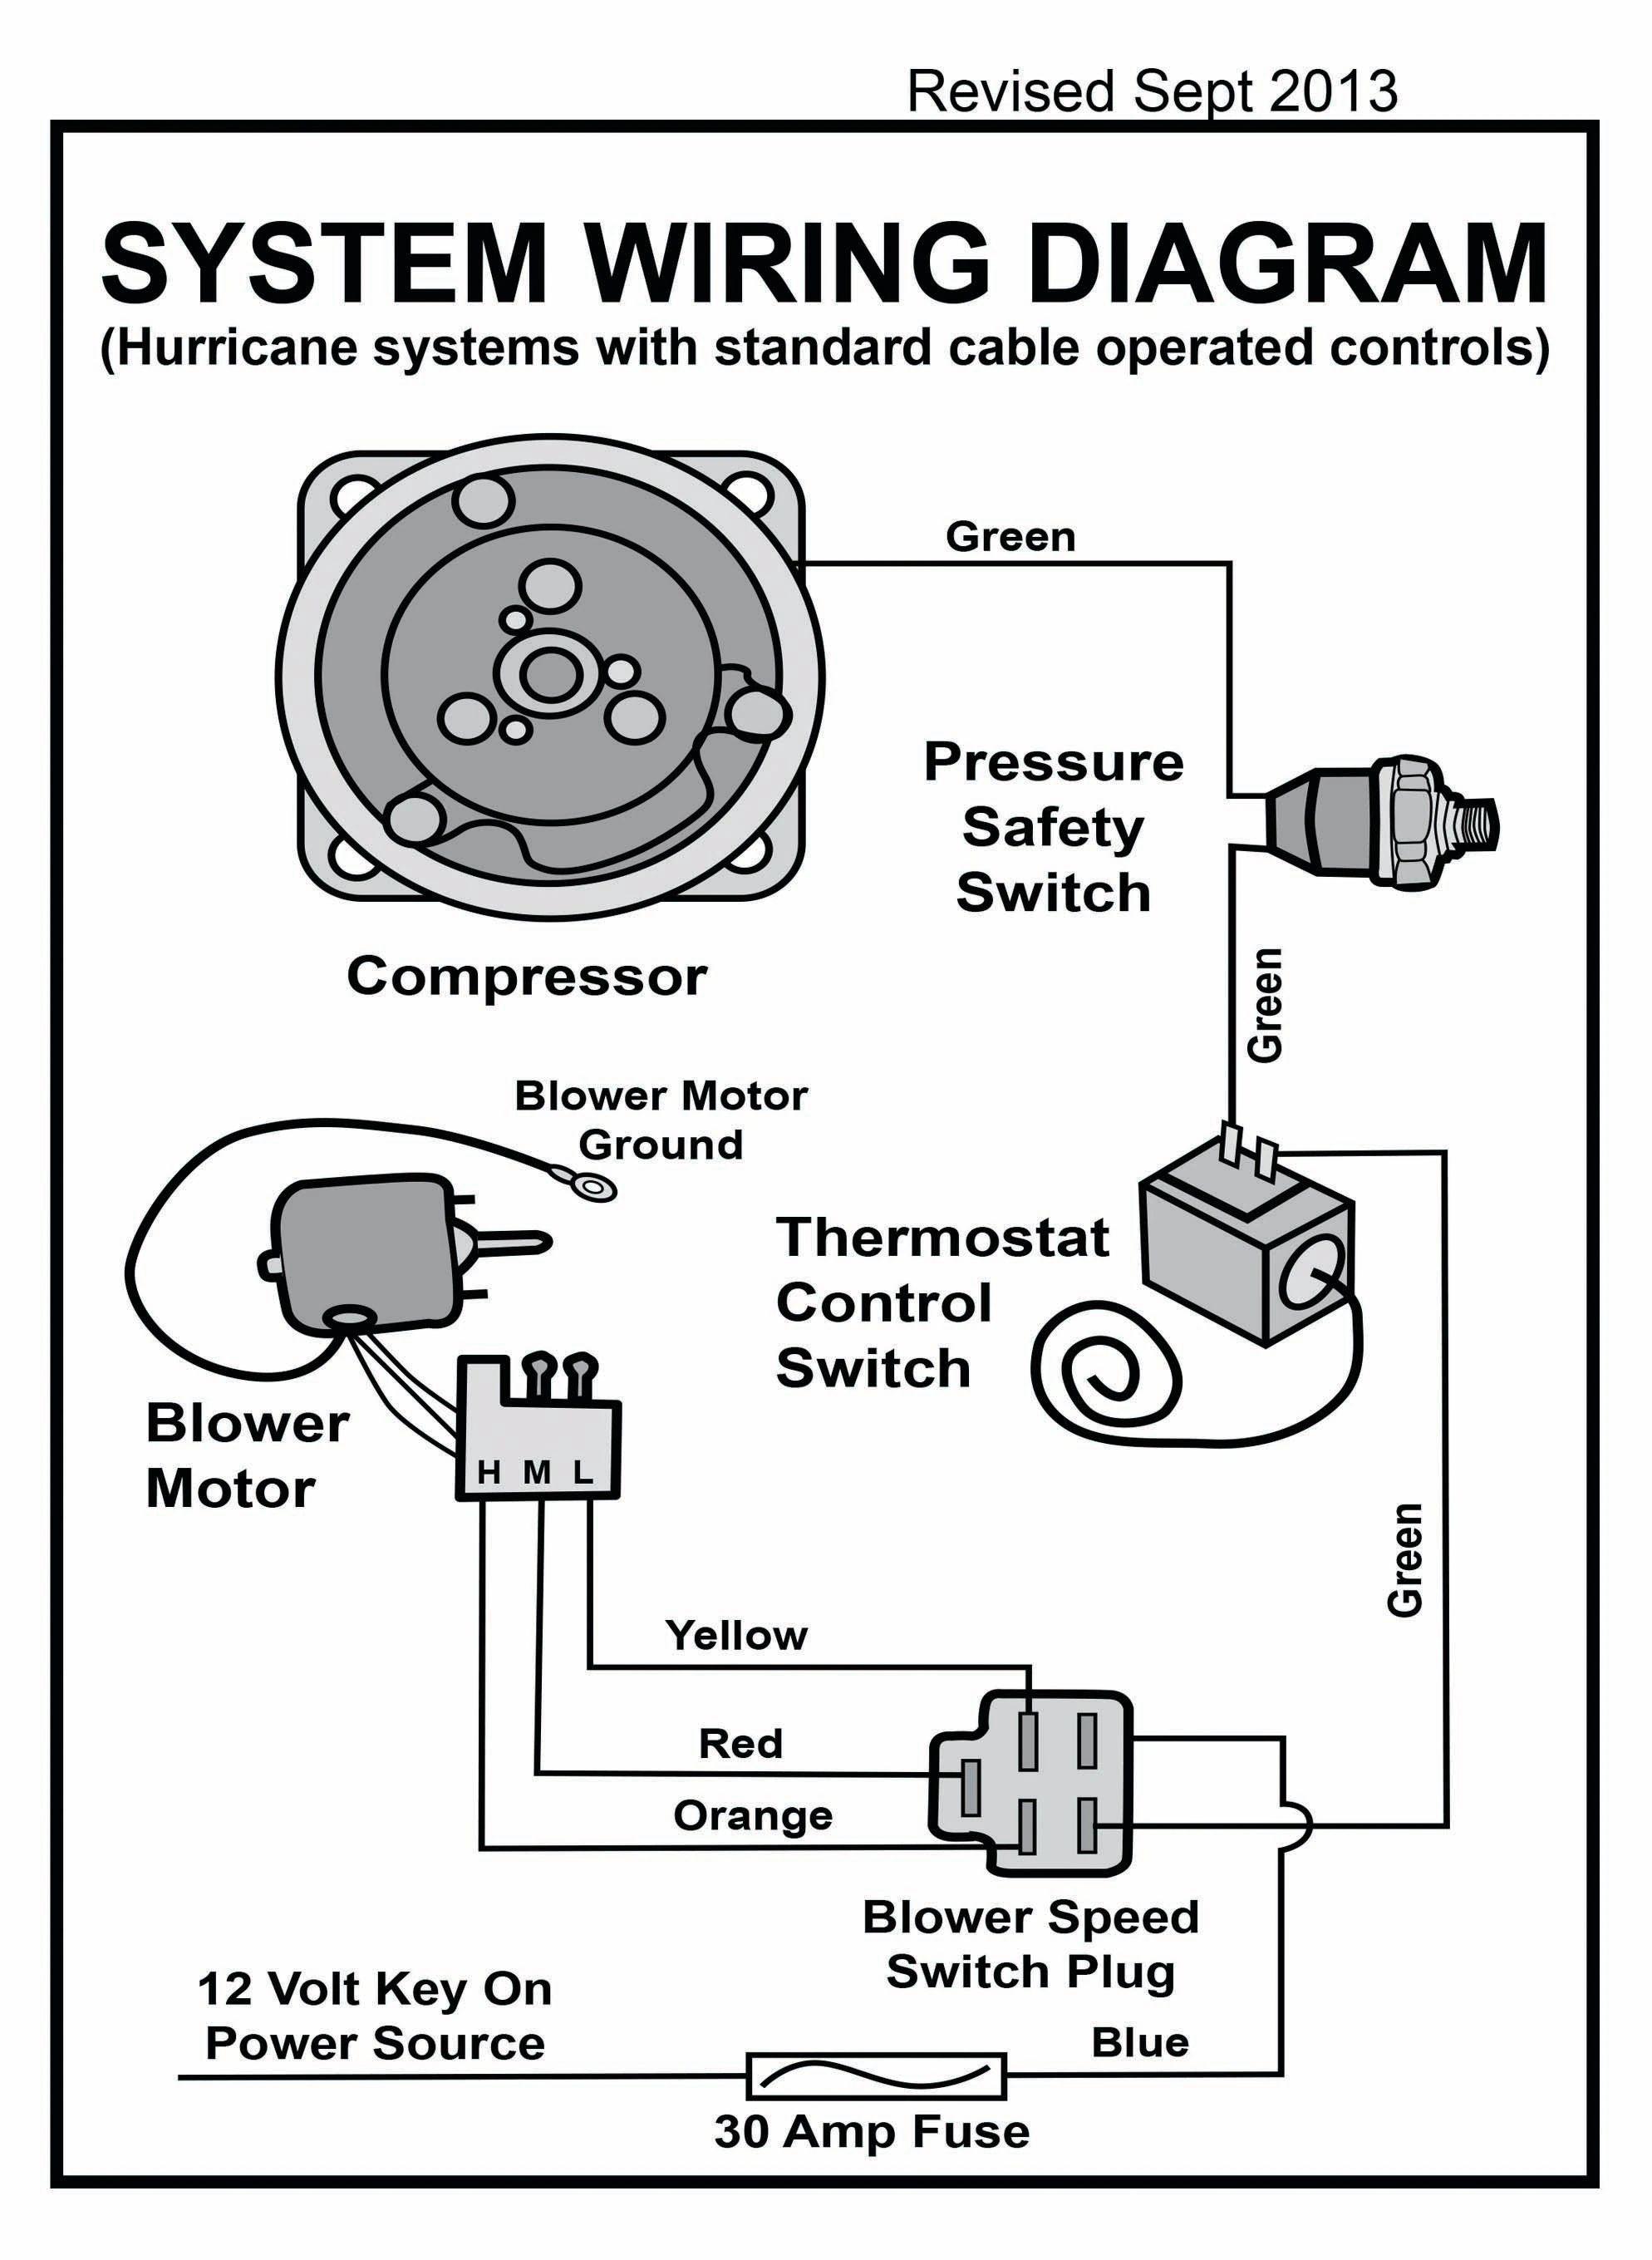 red dot binary switch wiring diagram